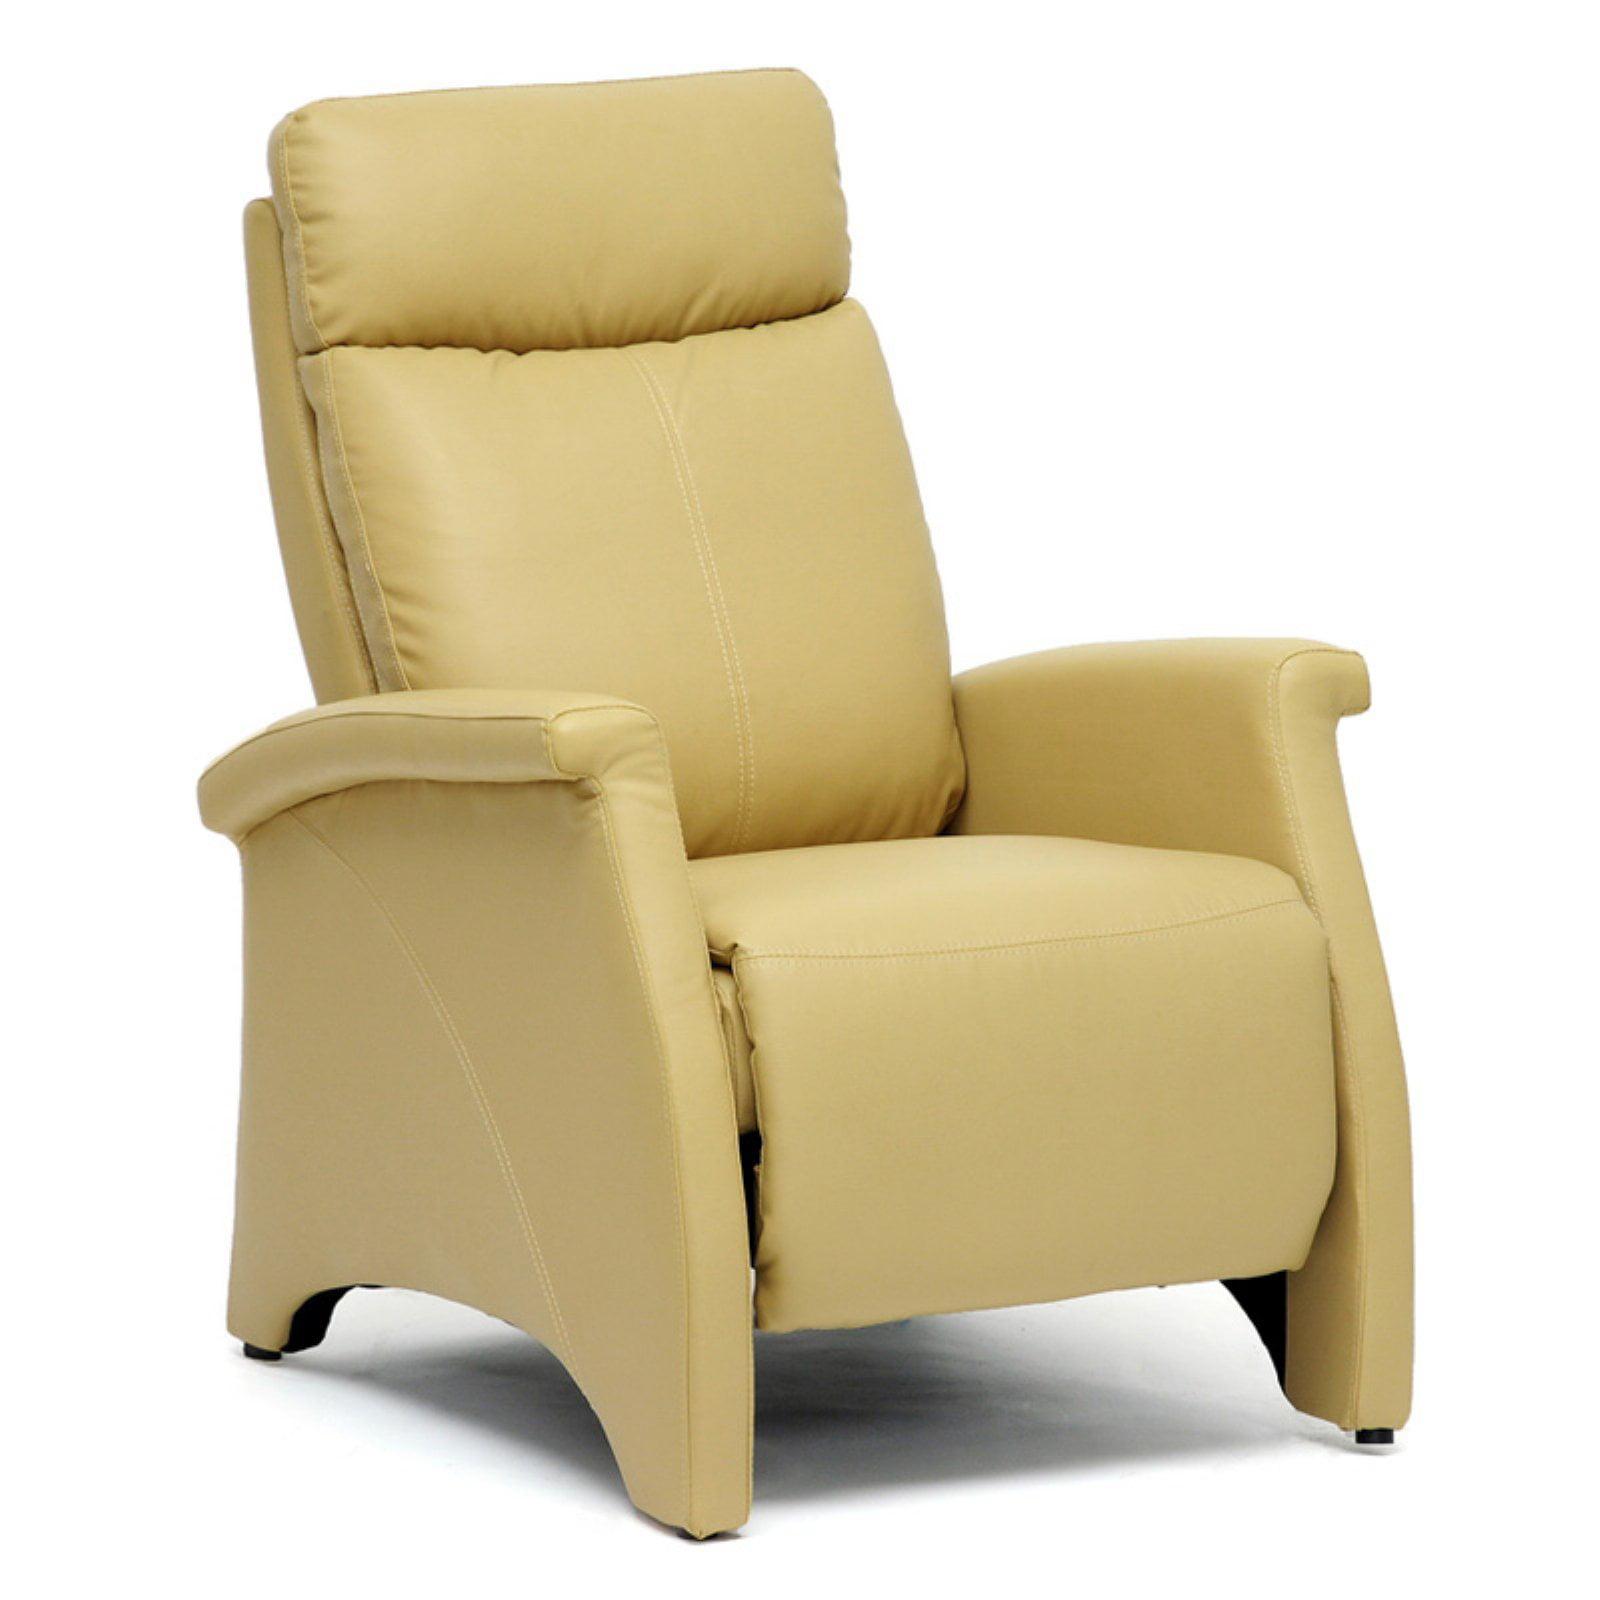 Aberfeld Tan Modern Recliner Club Chair by Baxton Studio